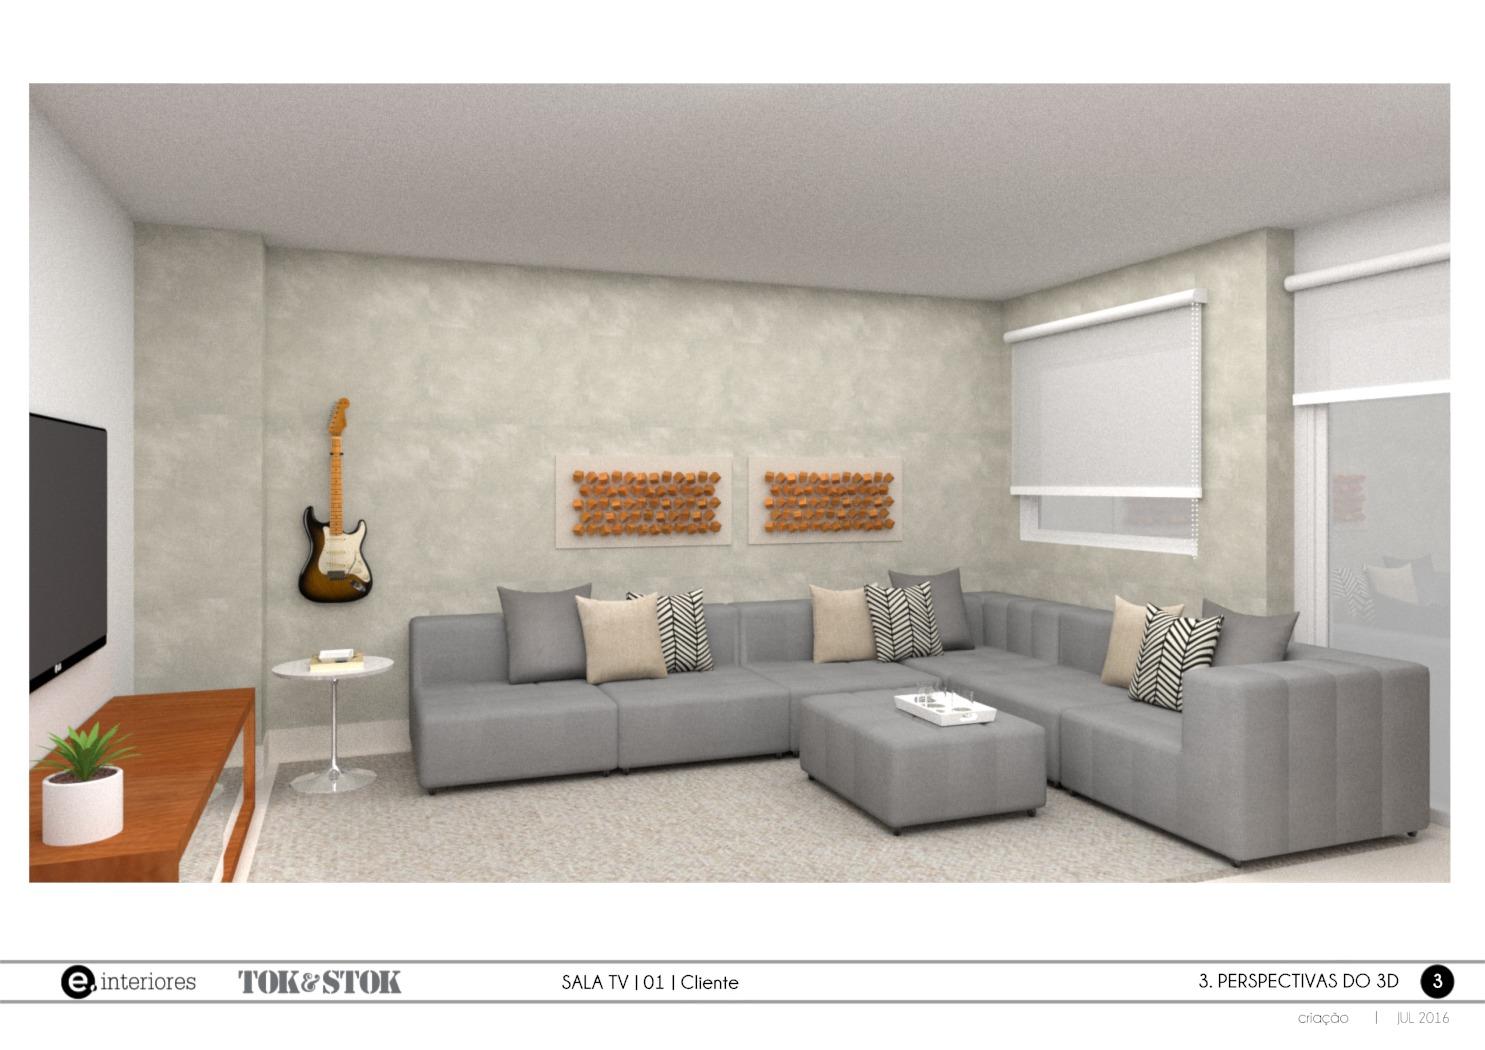 E Interiores Next Generation Interior Design With Blender Blender Org